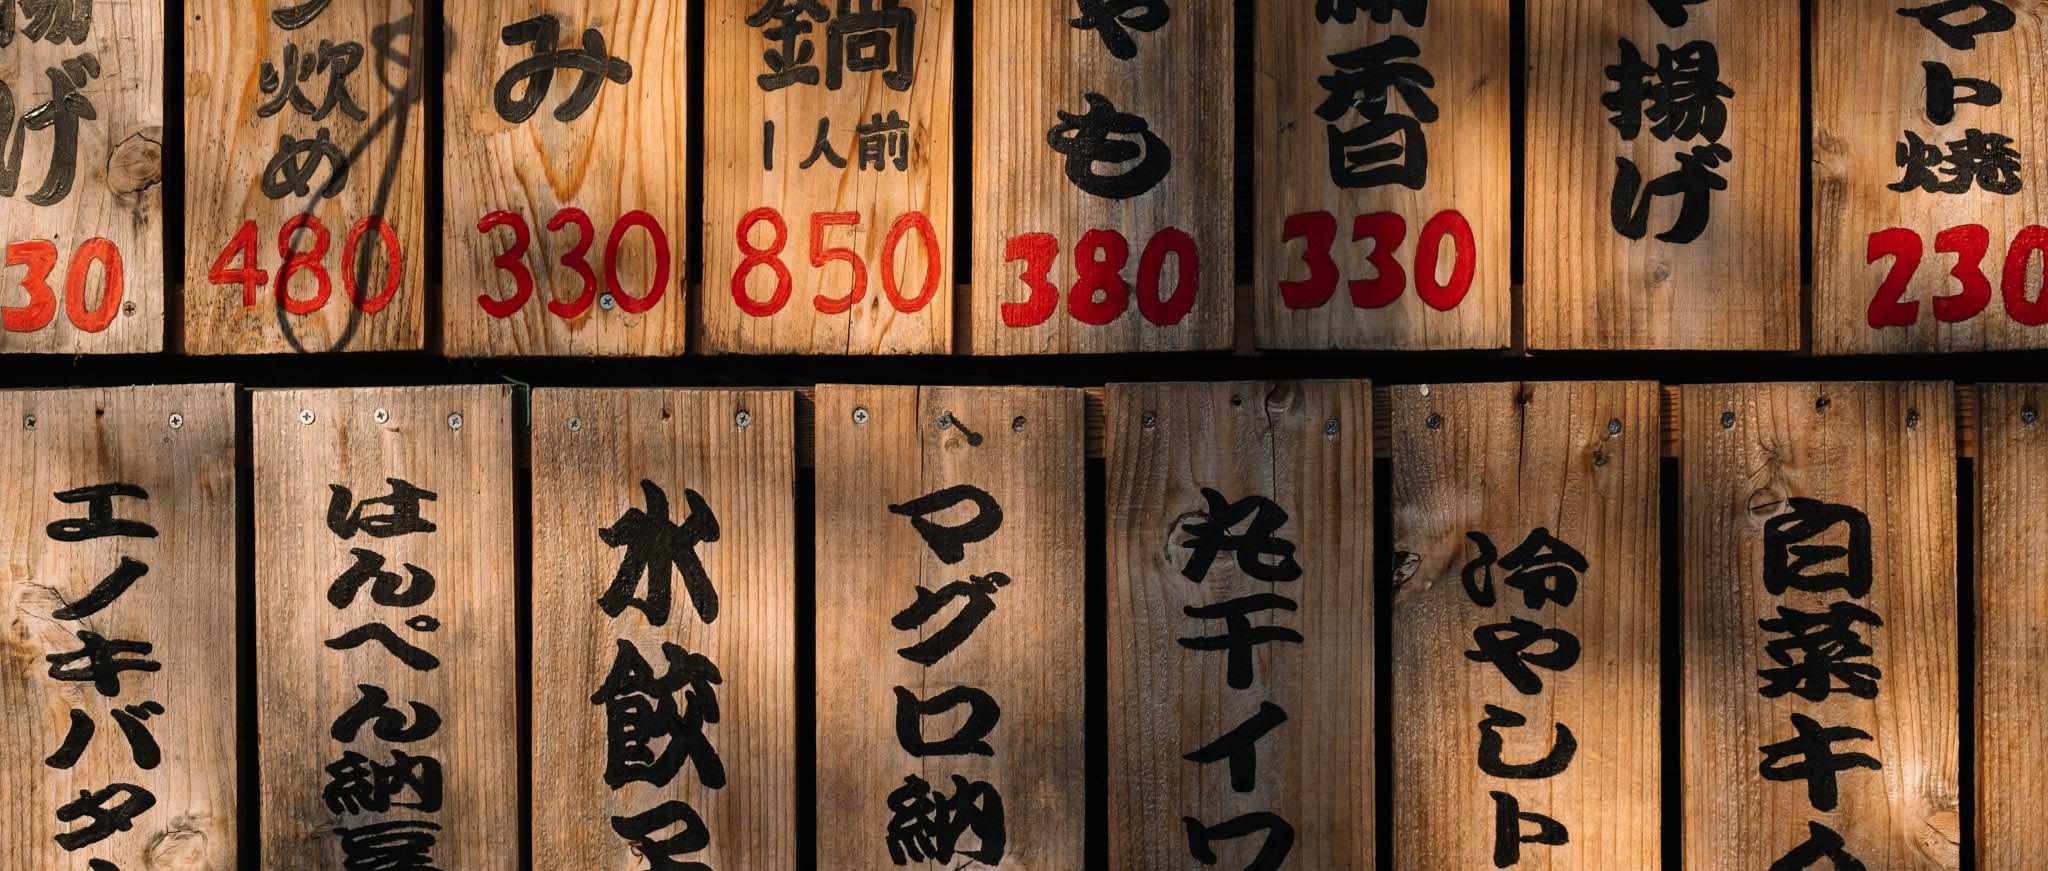 chris_eberhardt_japan_travel_reise_nippon-27.jpg